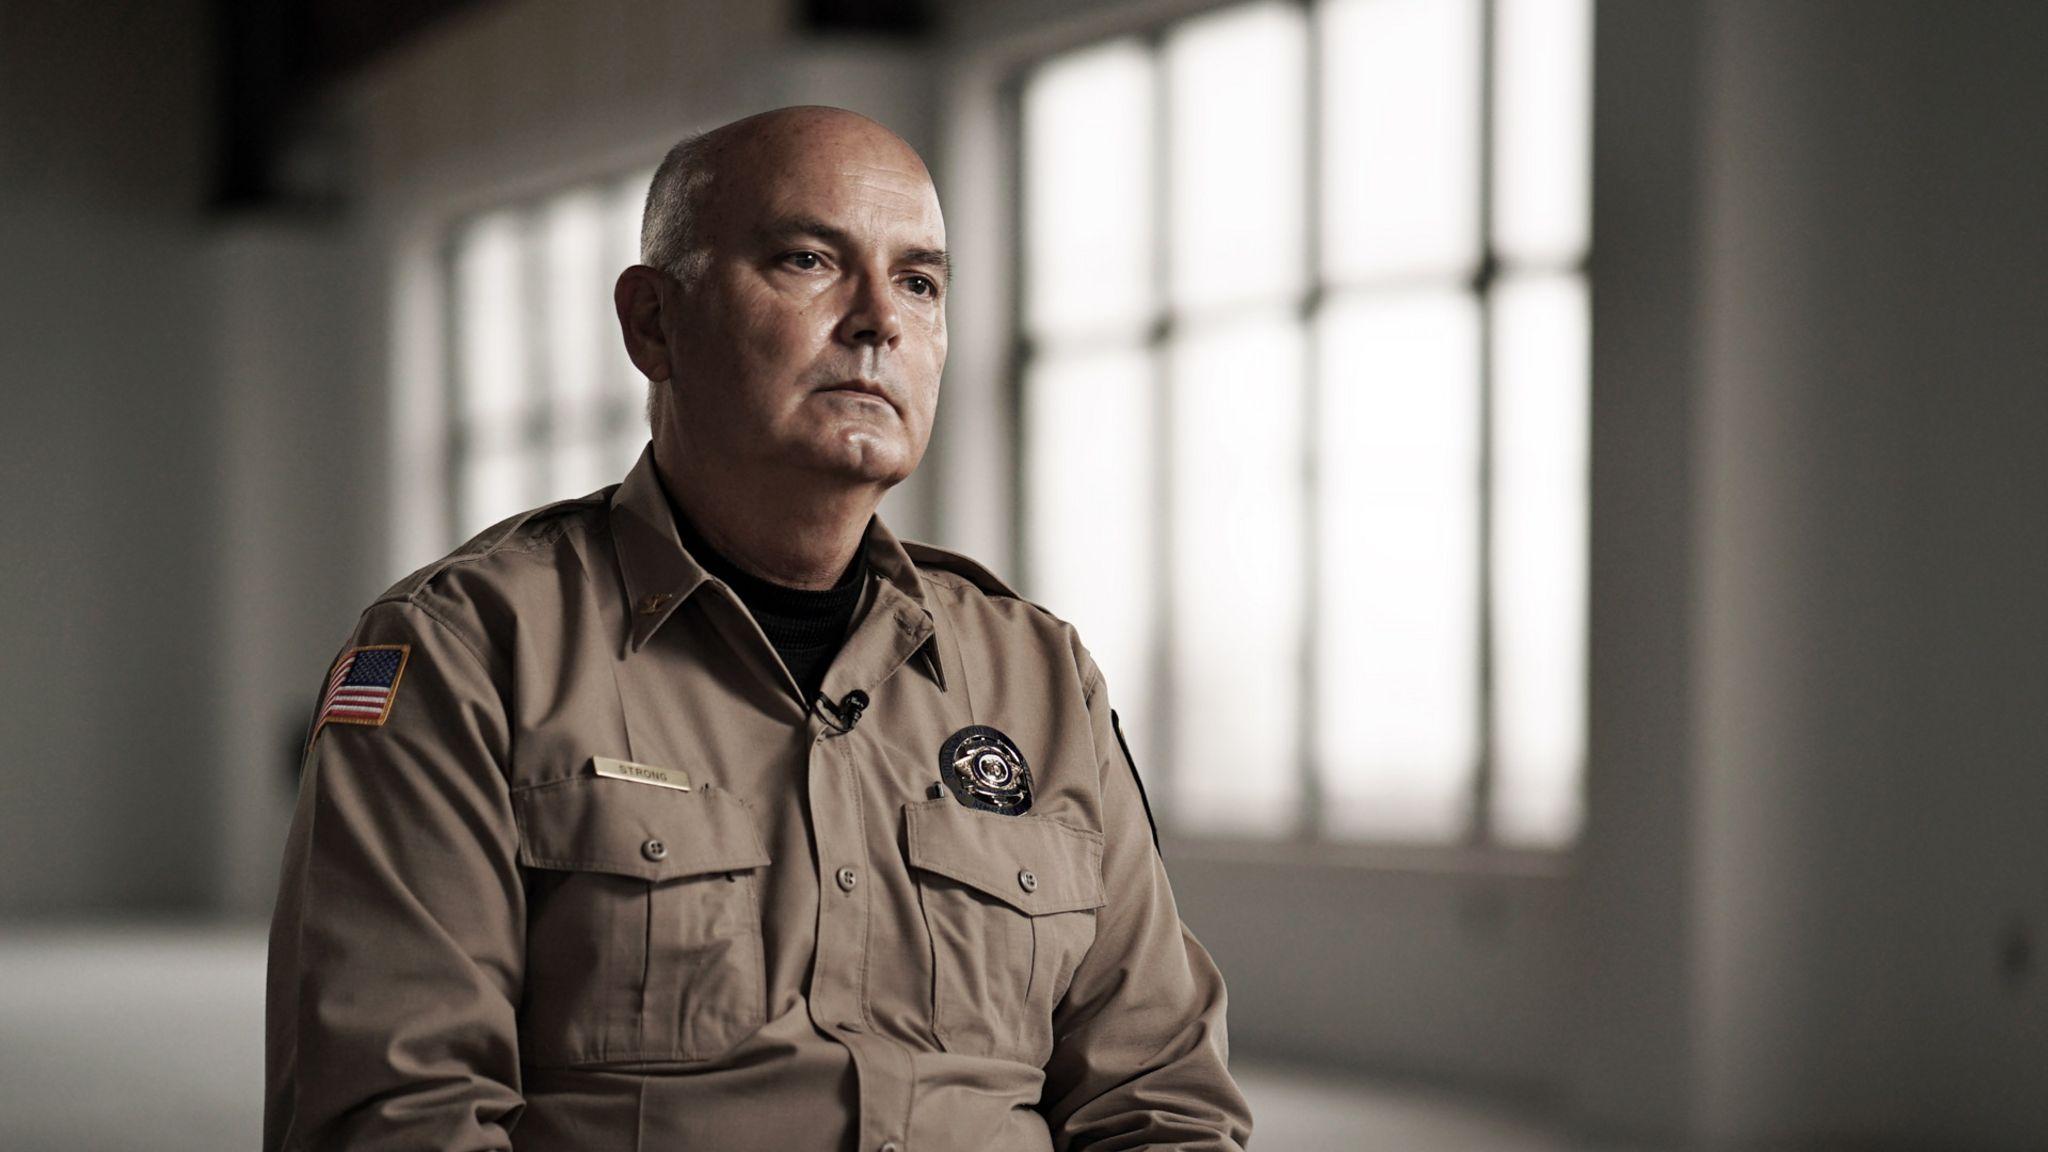 Randy Strong, Nodaway County Sheriff